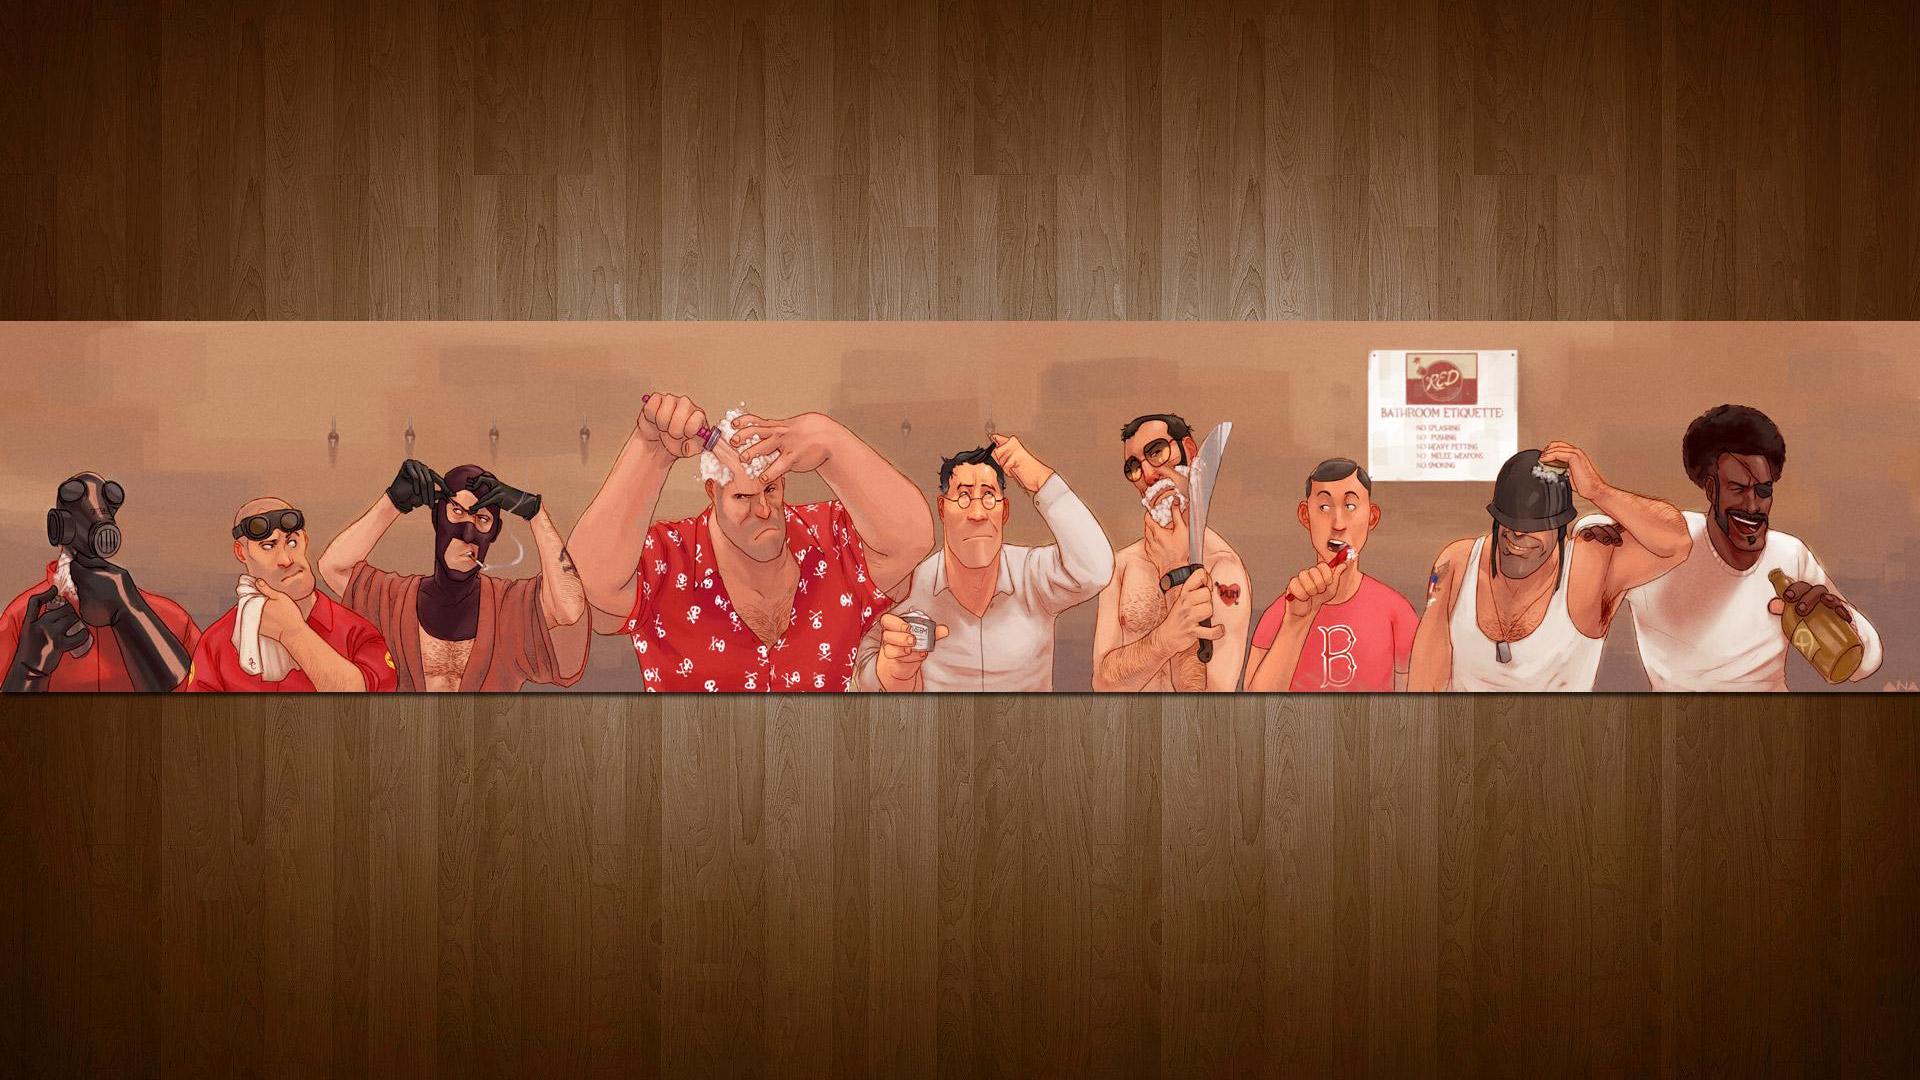 Team Fortress 2 wallpaper 13